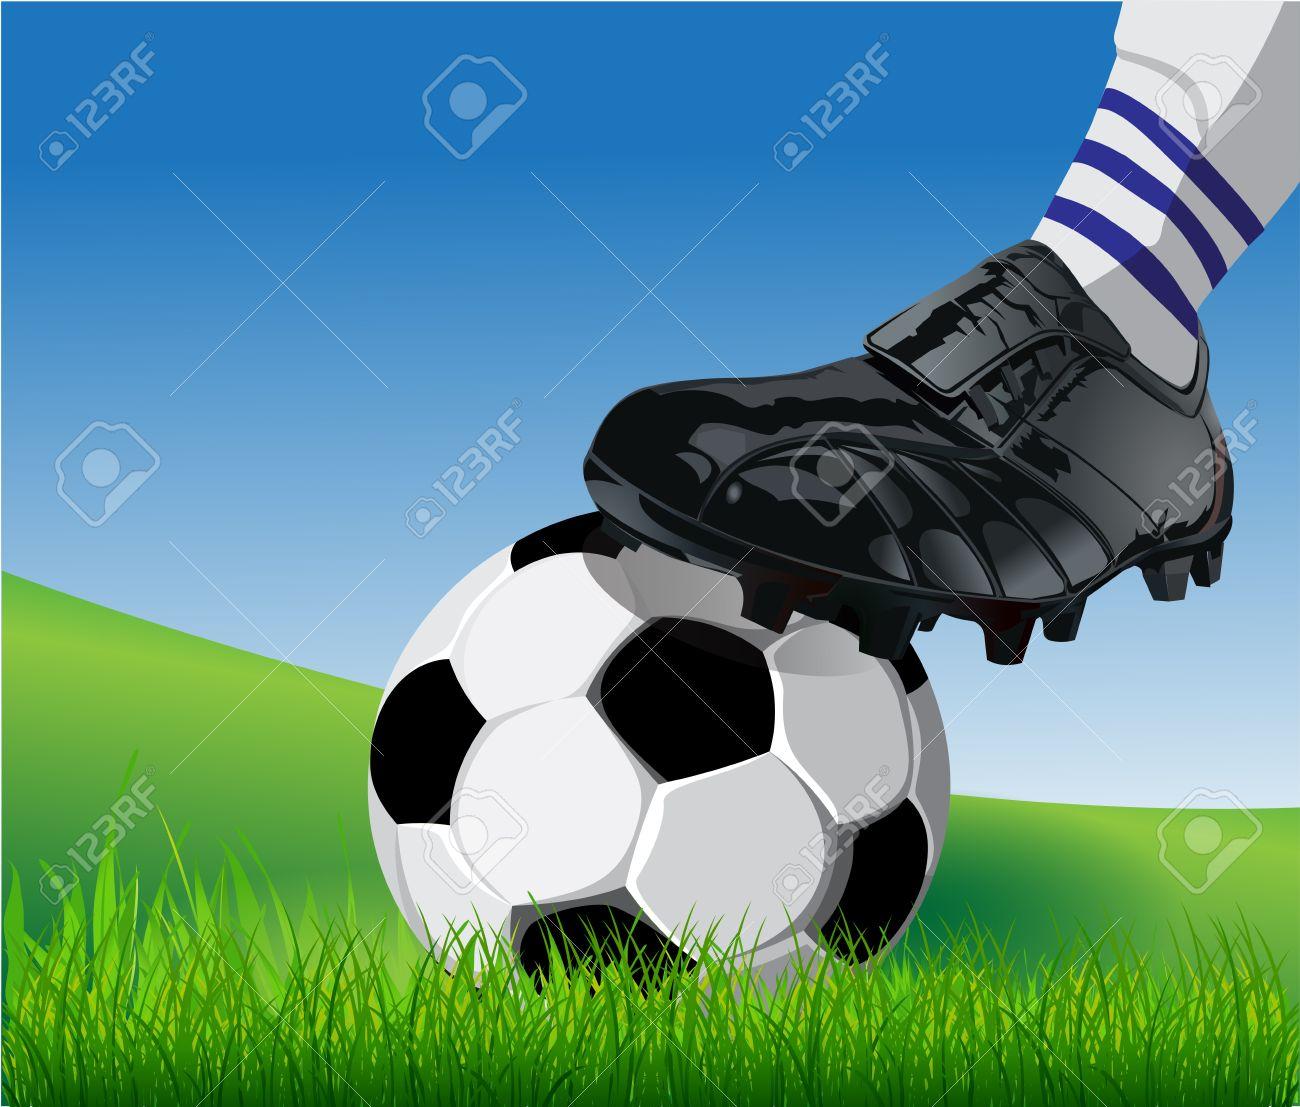 Football or soccer ball at the kickoff of a game Stock Vector - 13496655